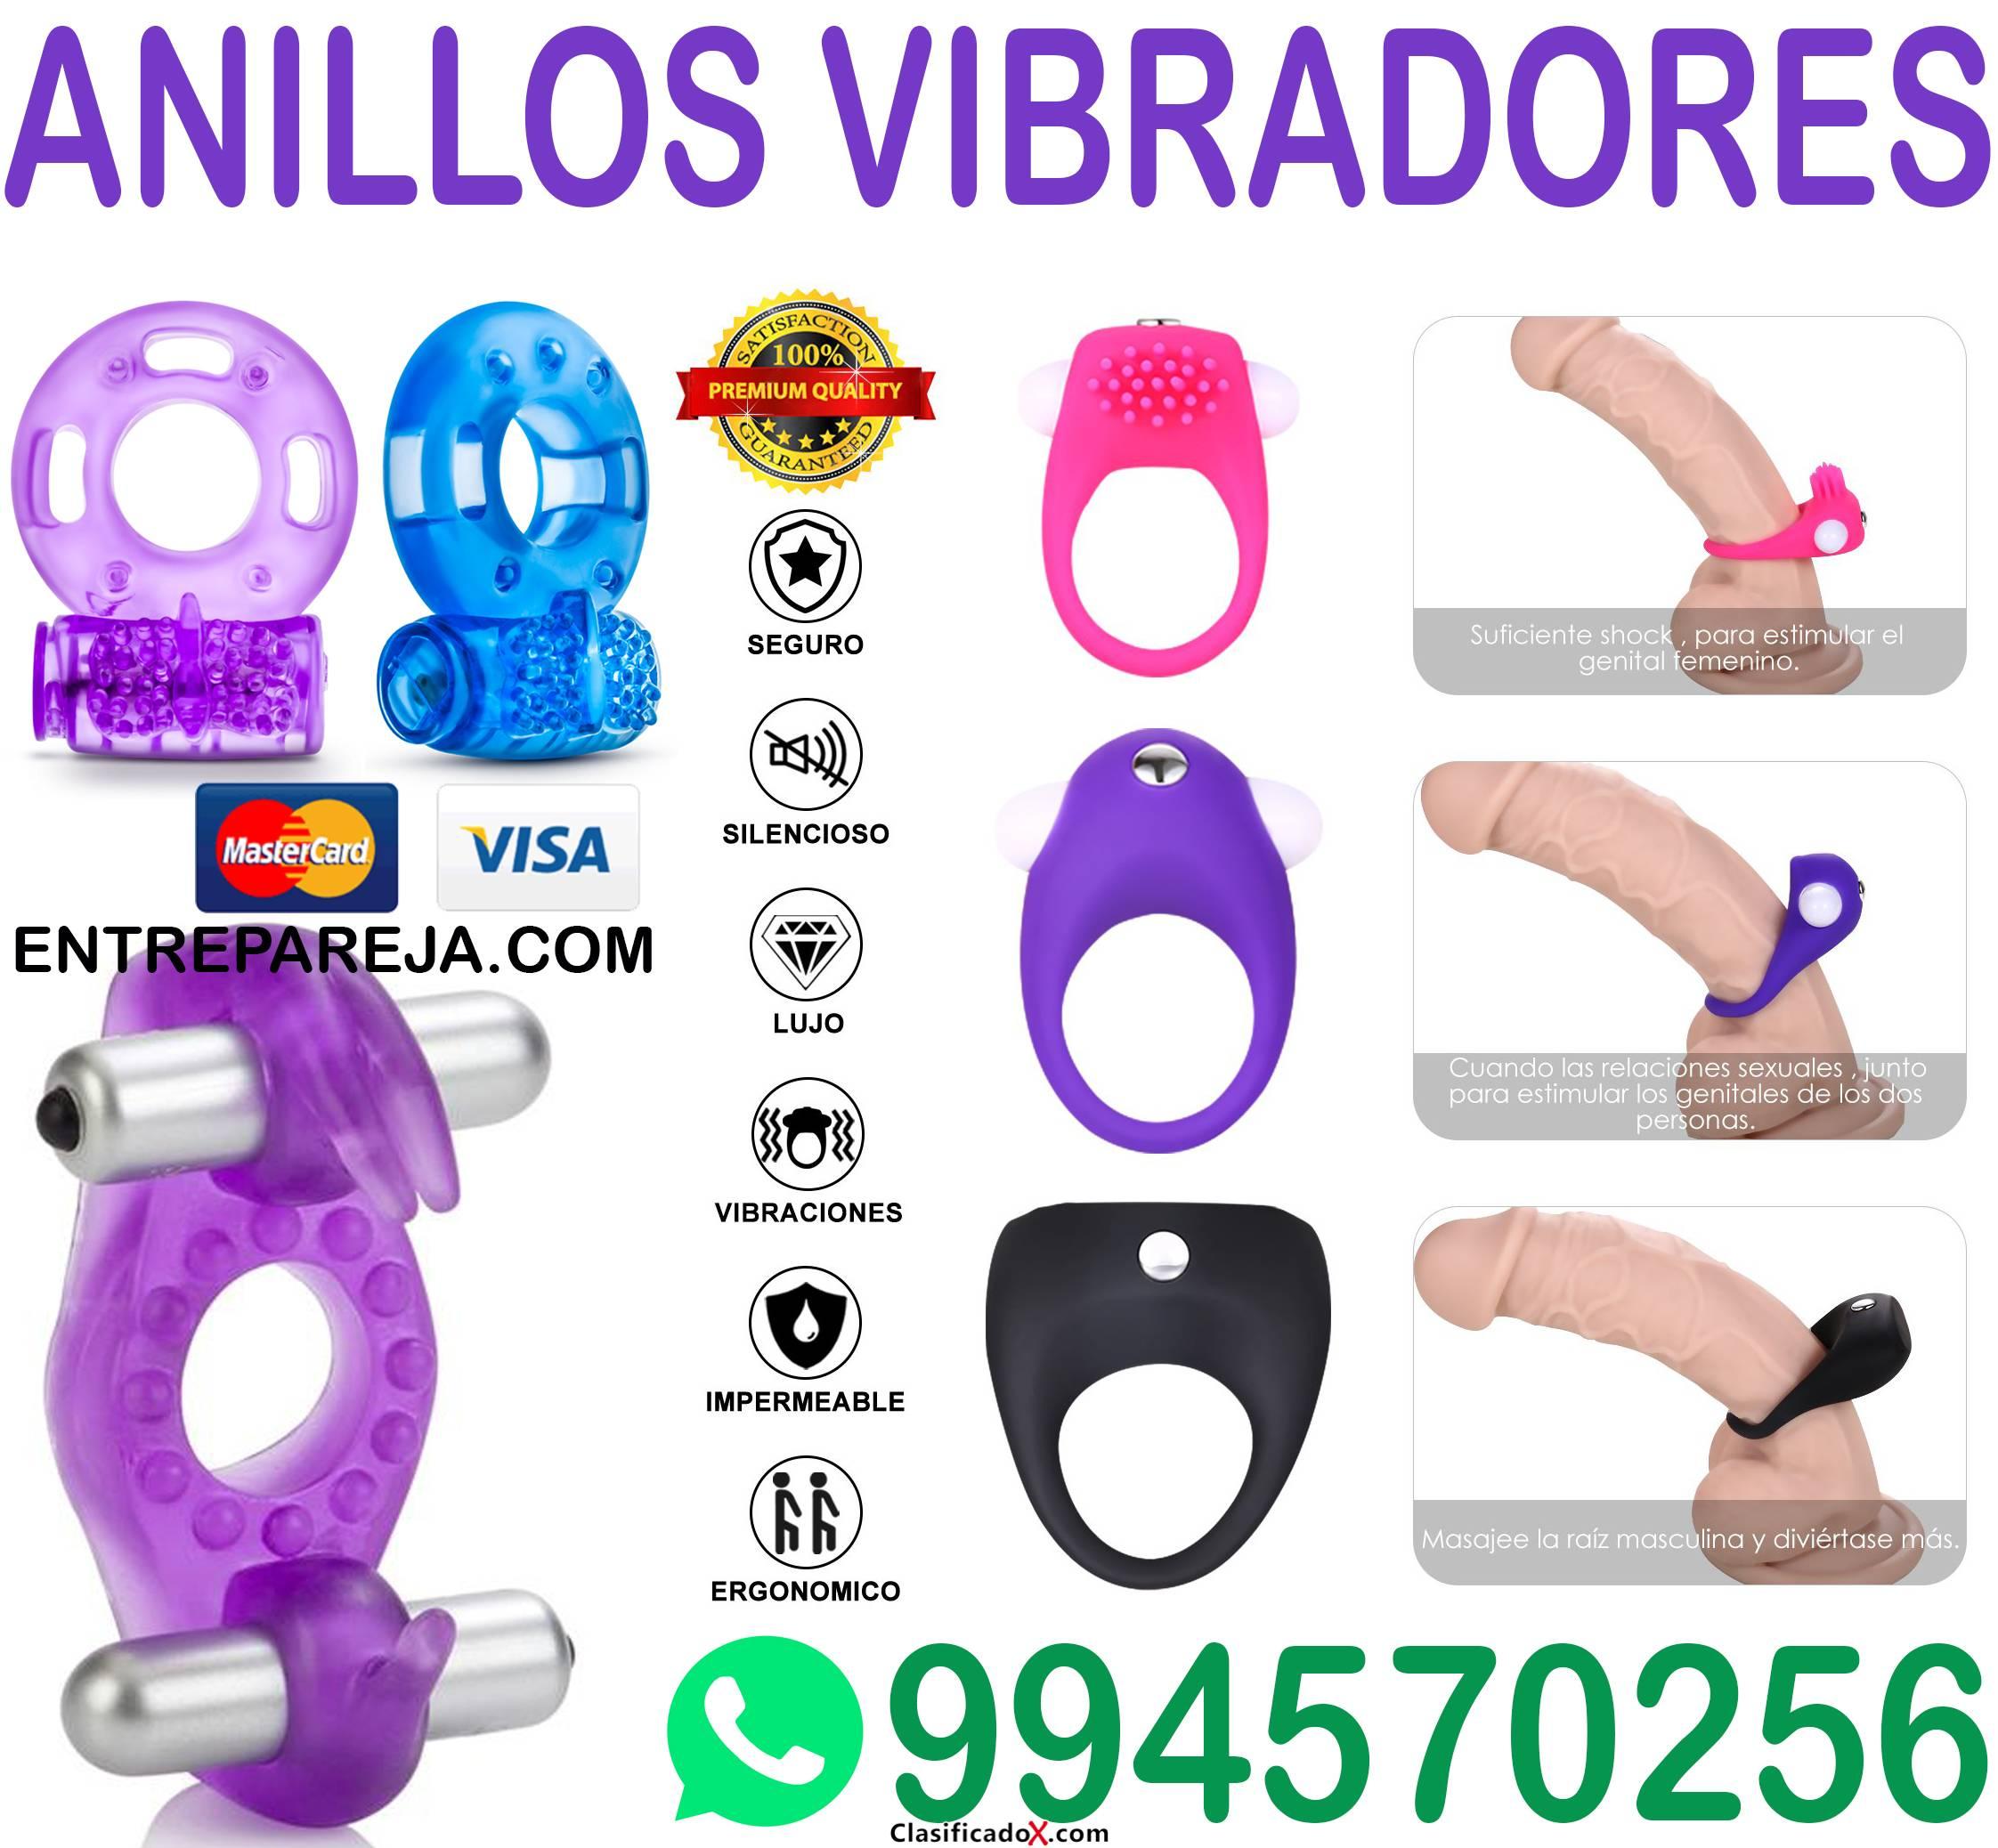 Sexshop Miraflores Dildos Lenceria Ofertas Tfl. 01 6221274 - 954838171